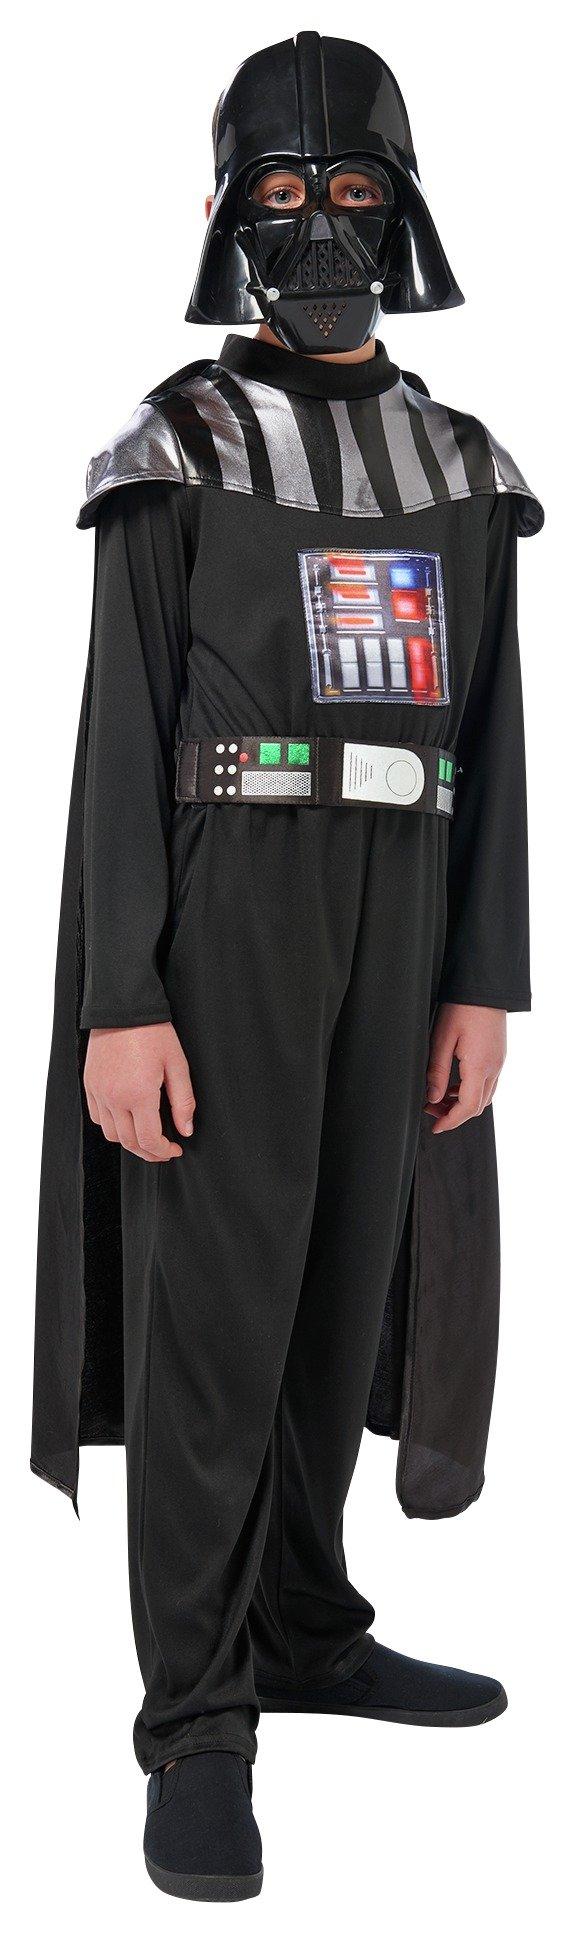 Star Wars Childrenu0027s Darth Vader Fancy Dress Costume  sc 1 st  Argos & Results for kids ninja costume